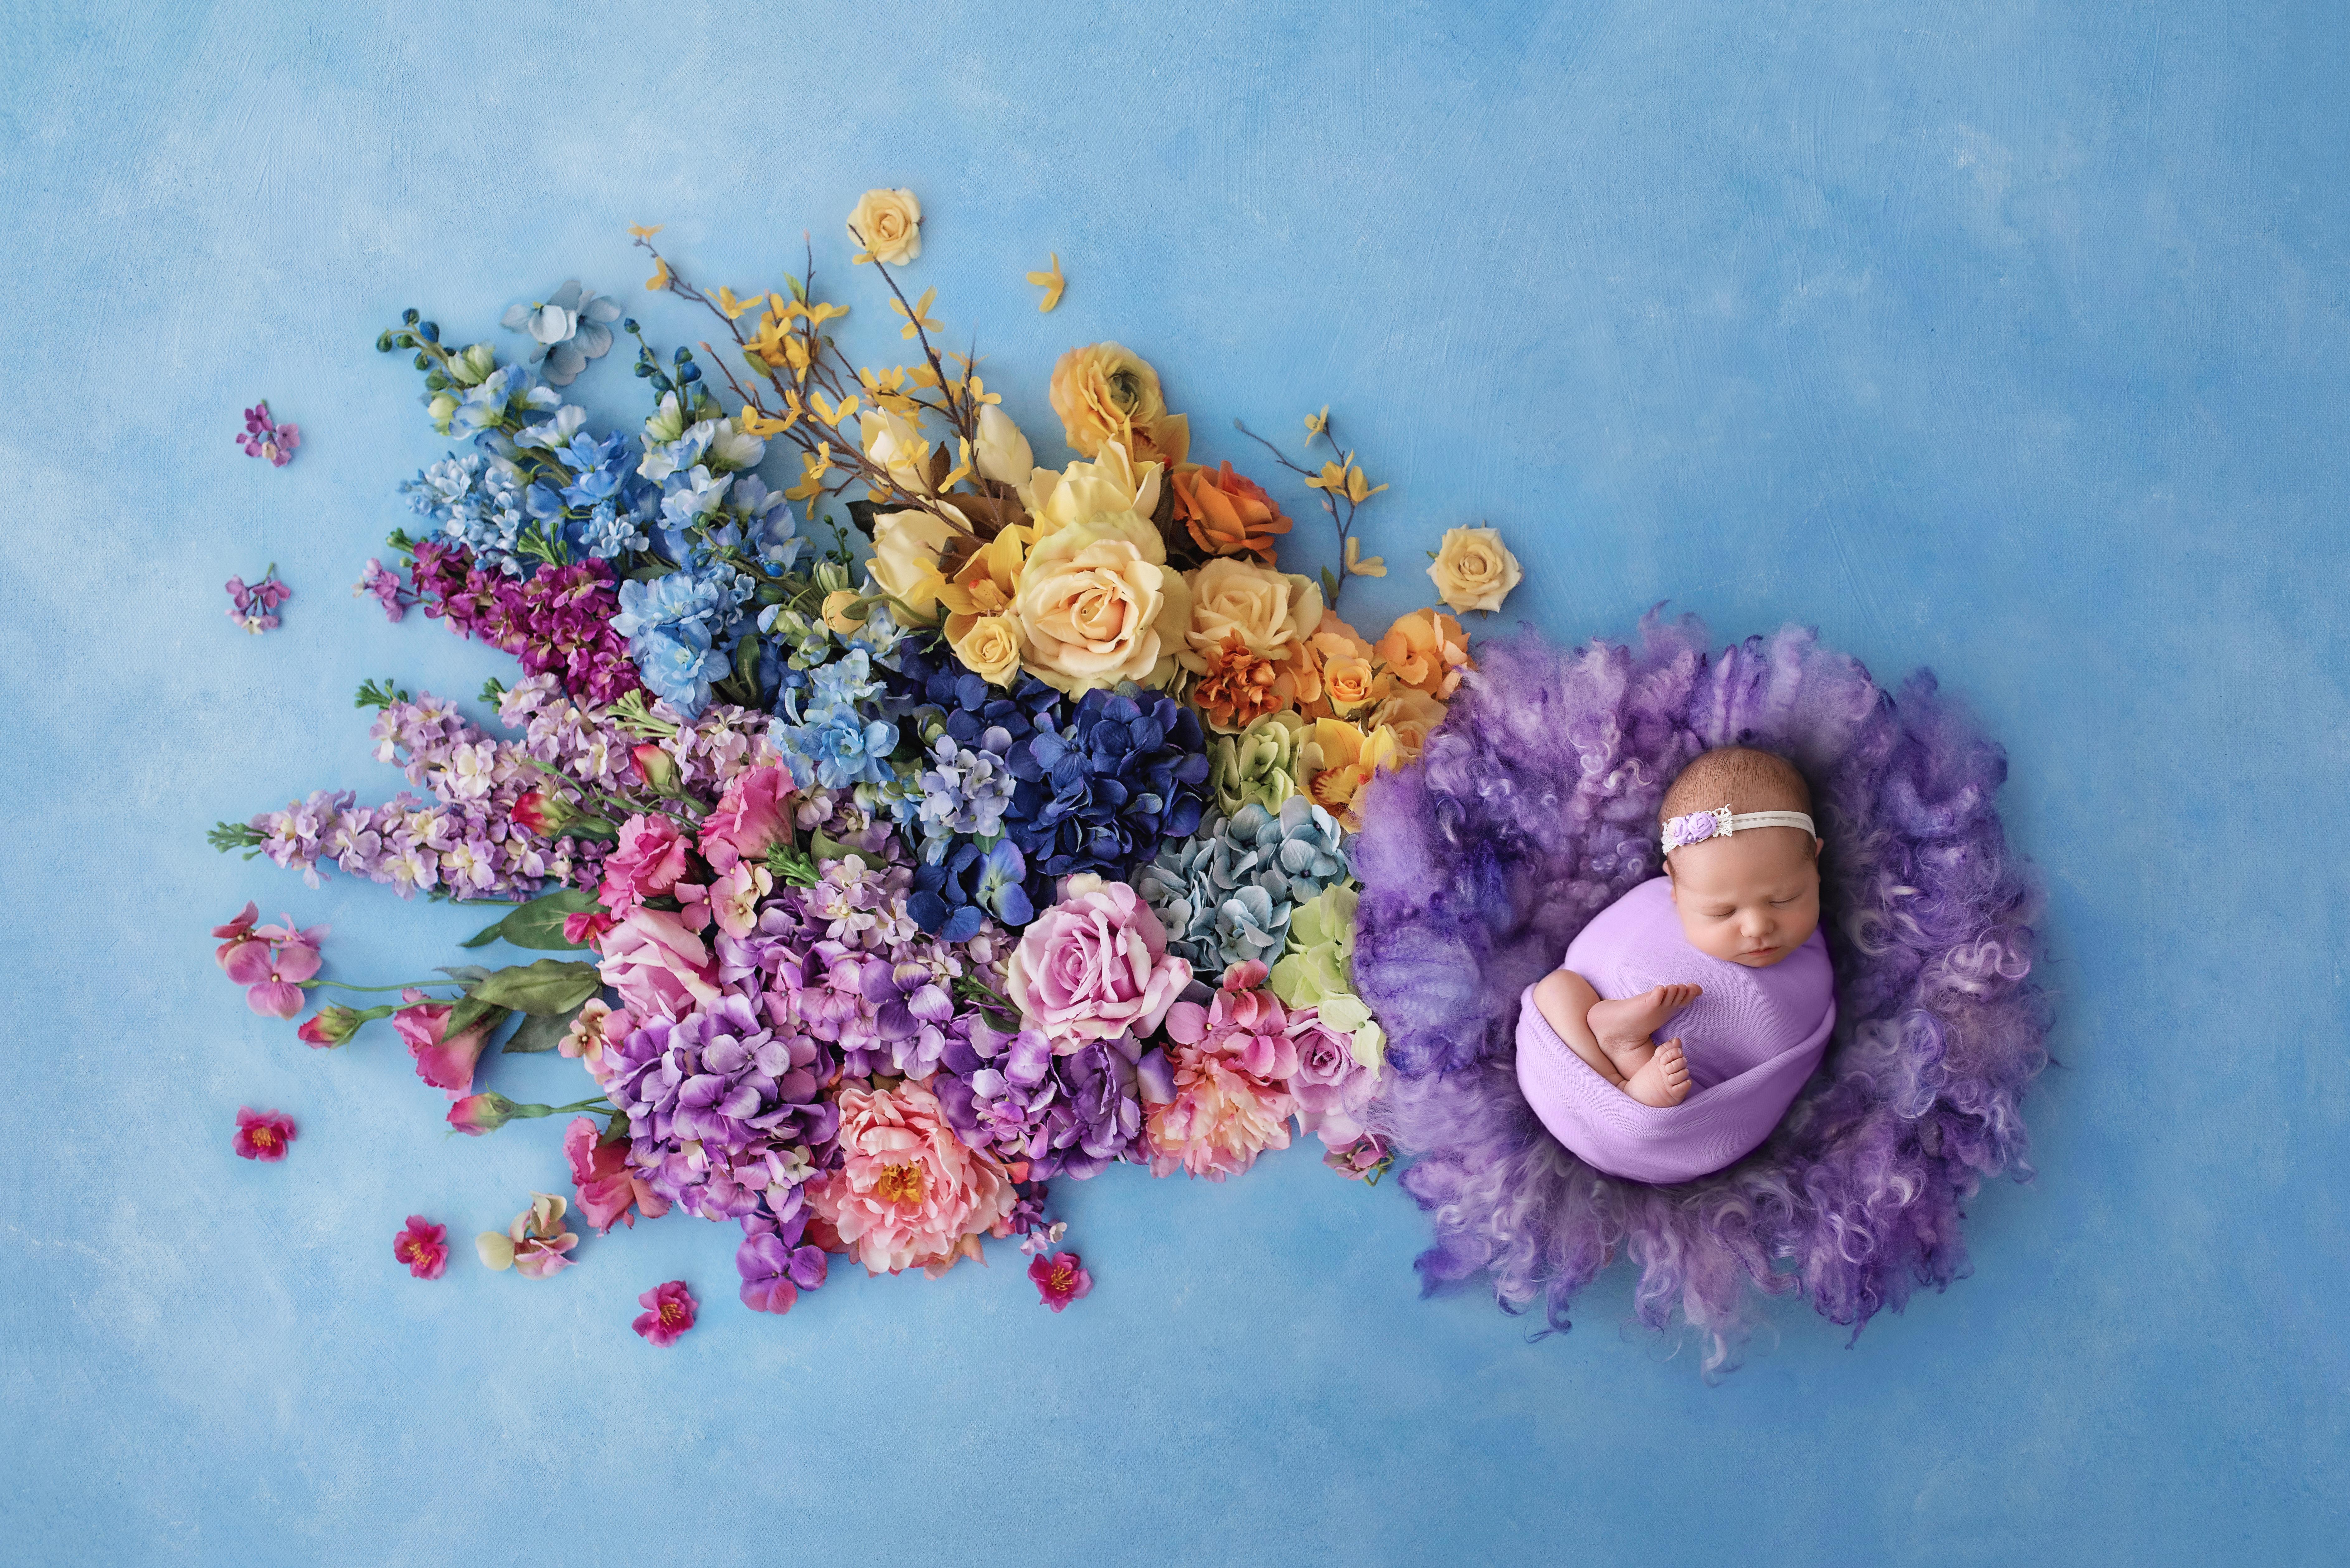 colorado, newborn, photographer, rainbow, baby, flowers